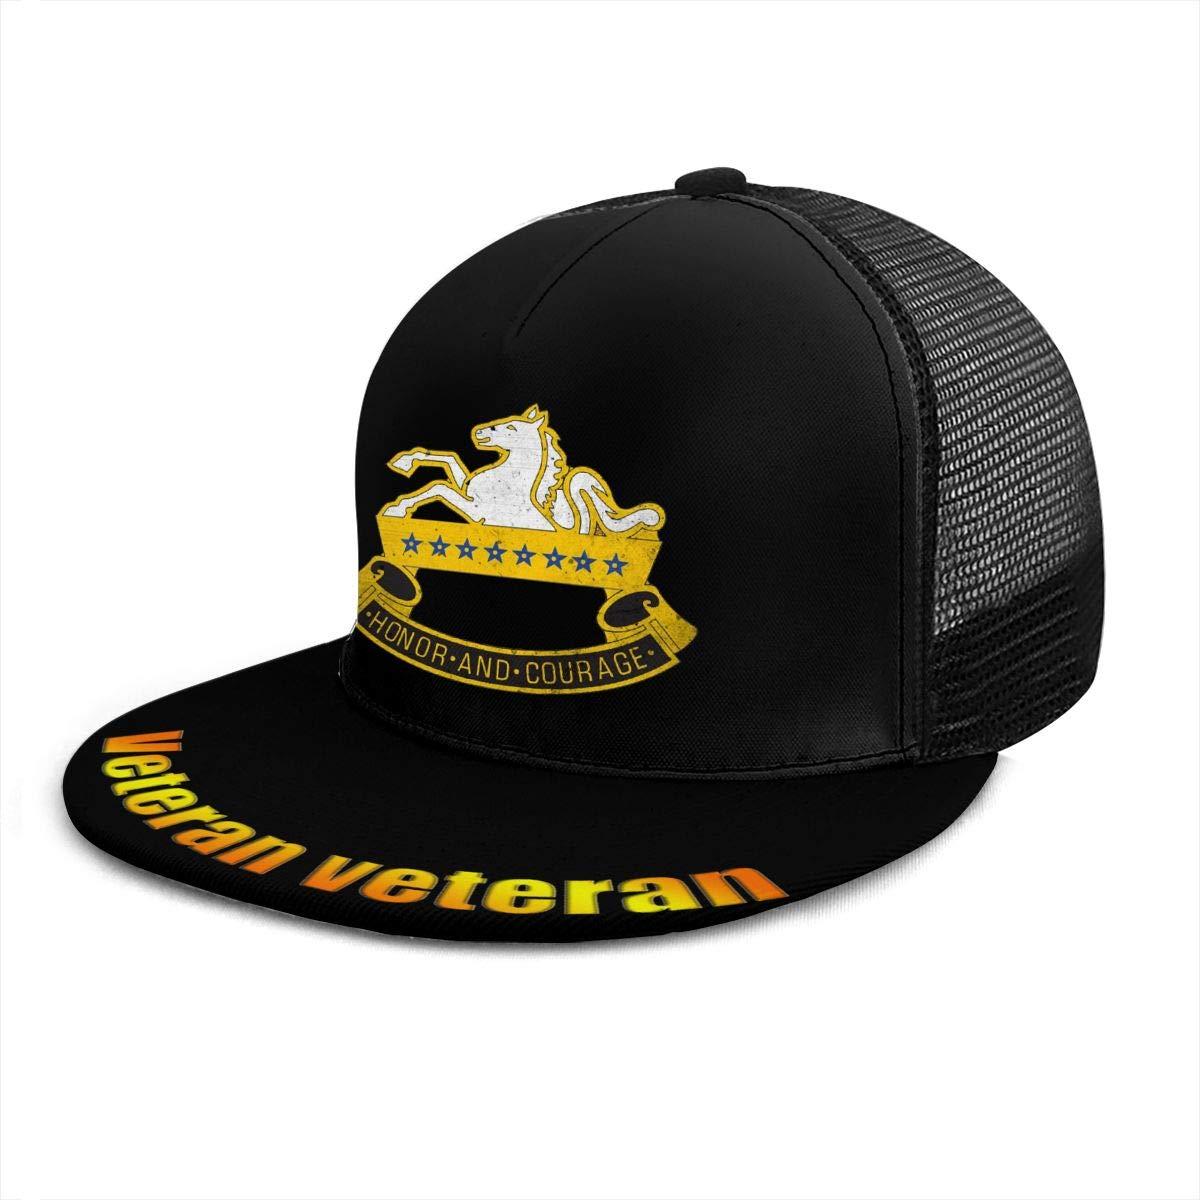 US Army Retro 8th Cavalry Regiment Classic Grid Caps Flat Along Baseball Hat Snapback Men Women Caps Adjustable